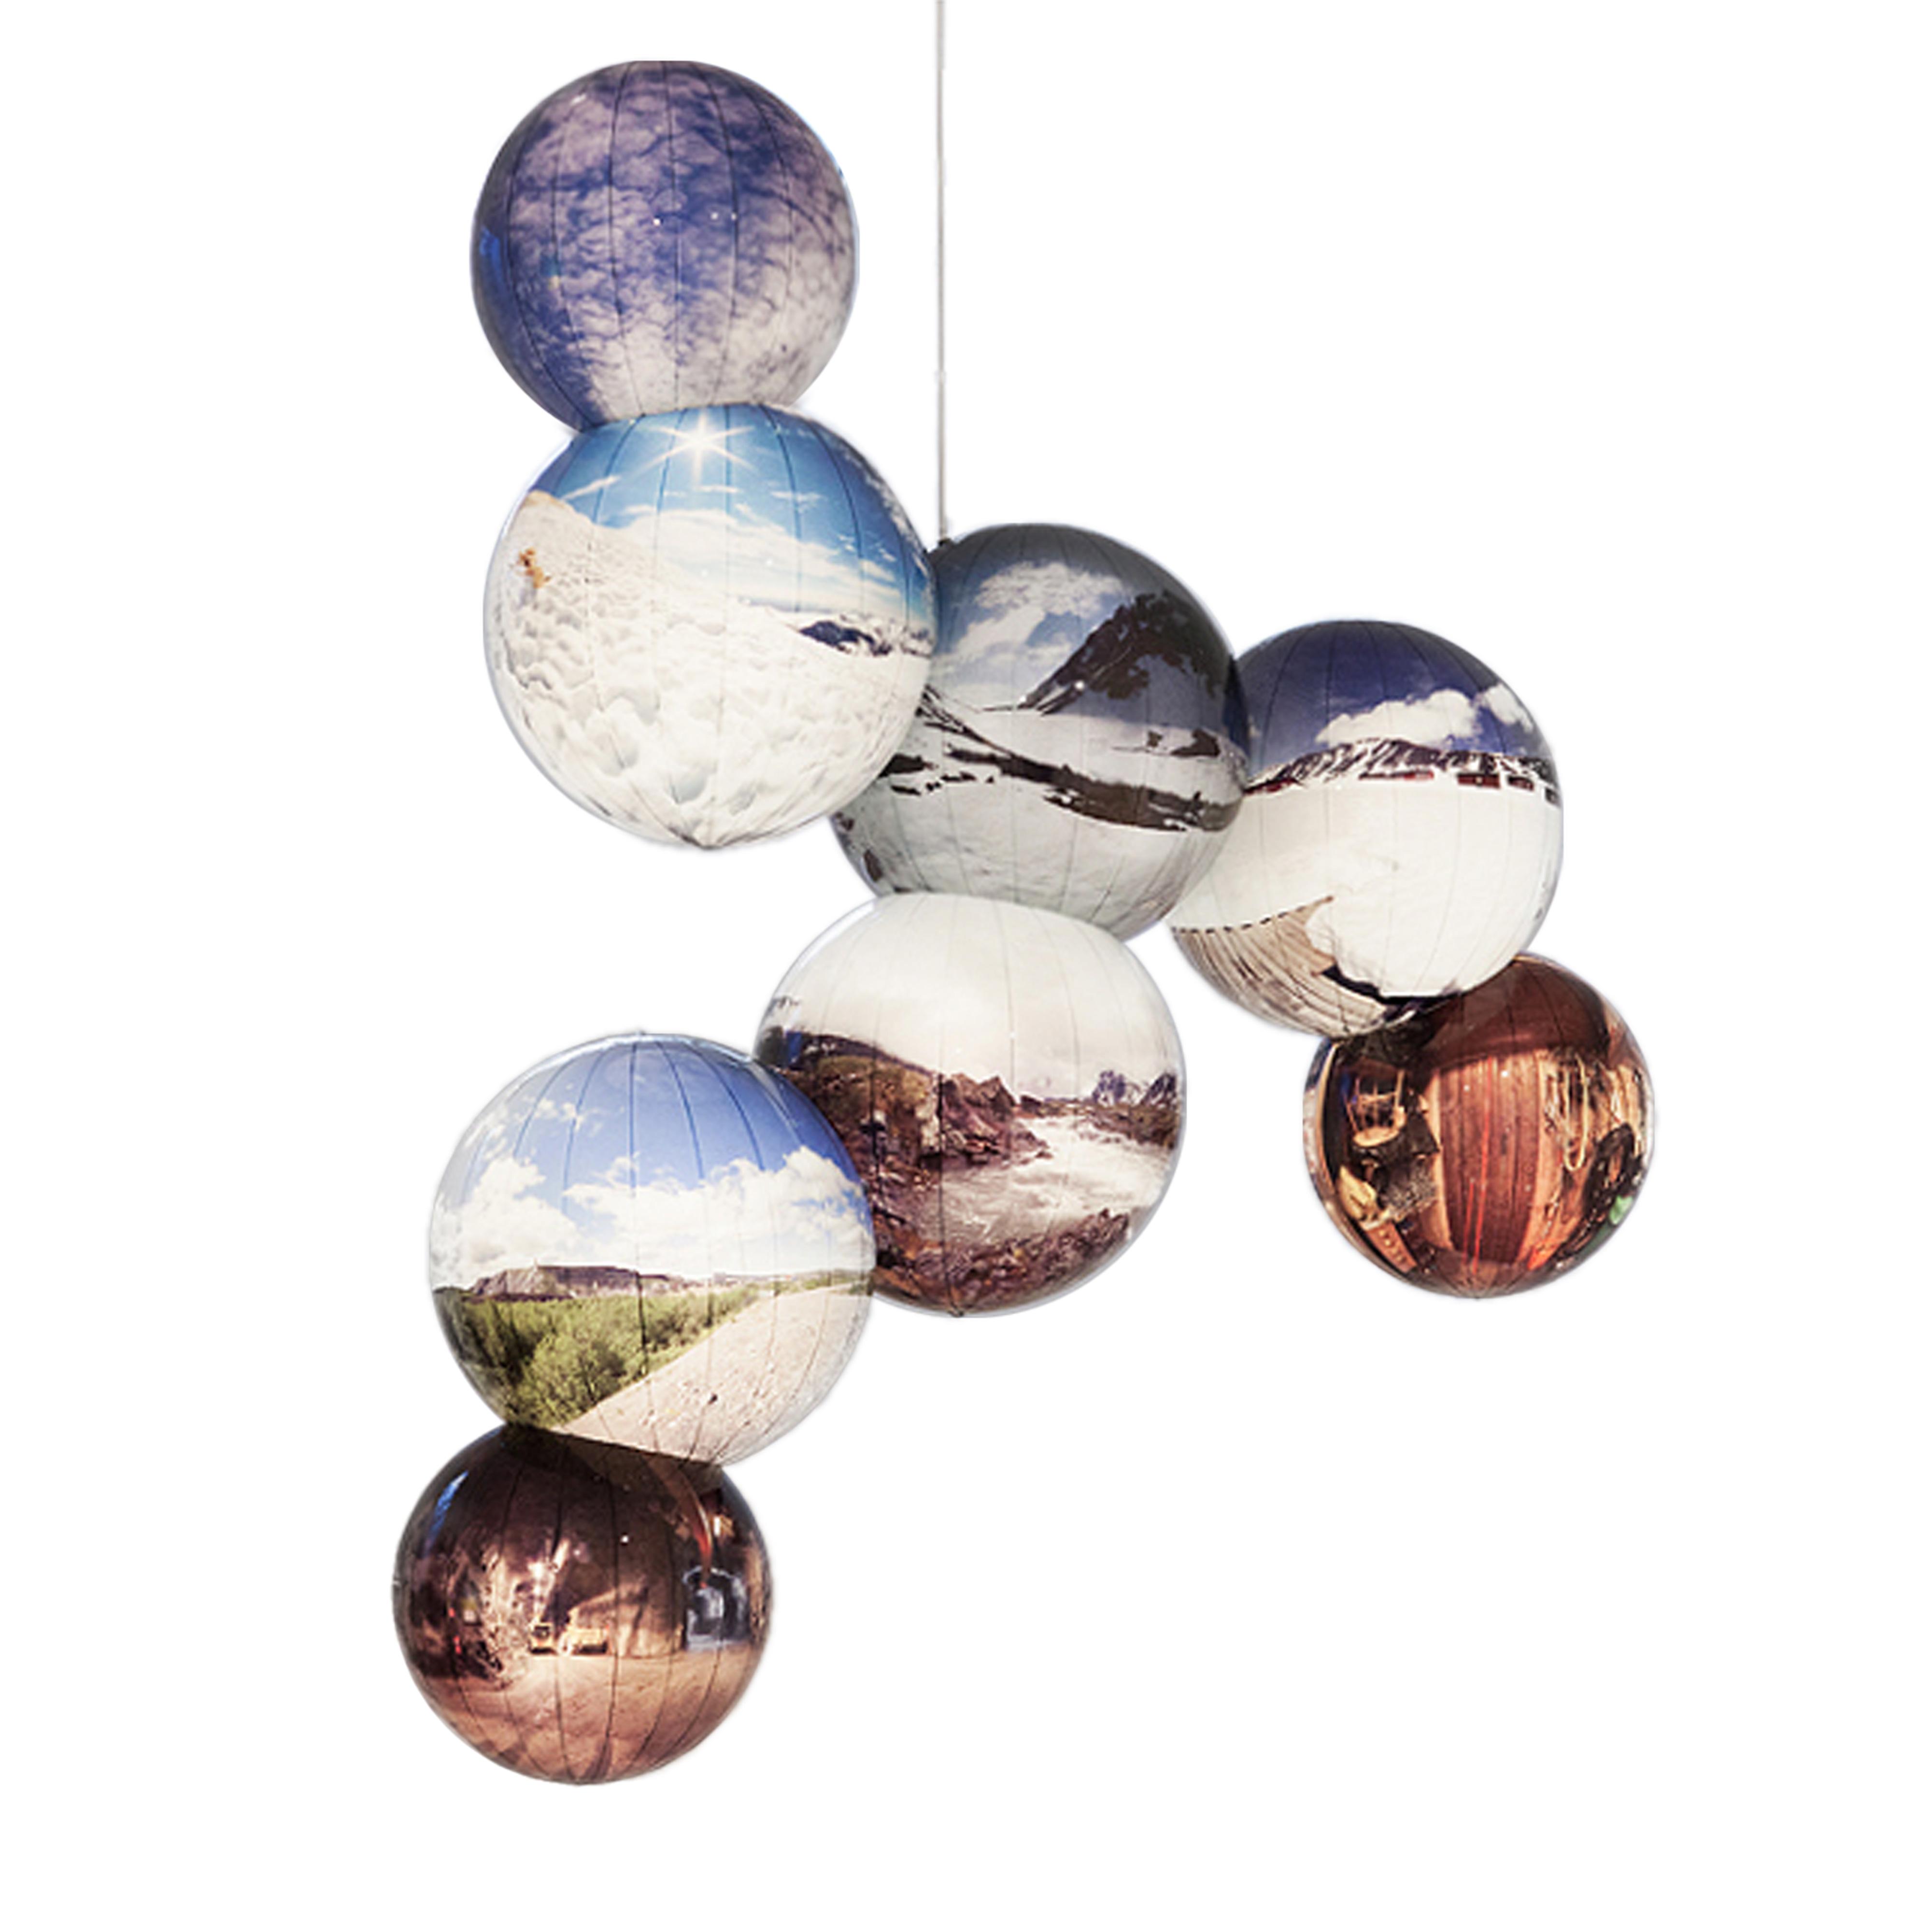 Galerie Barbara Thumm \ ZWANZIG anniversary exhibition 20 years Galerie Barbara Thumm \ Rescue Blanket for Kebnekaise (Inverted Space Molecule) (2015)